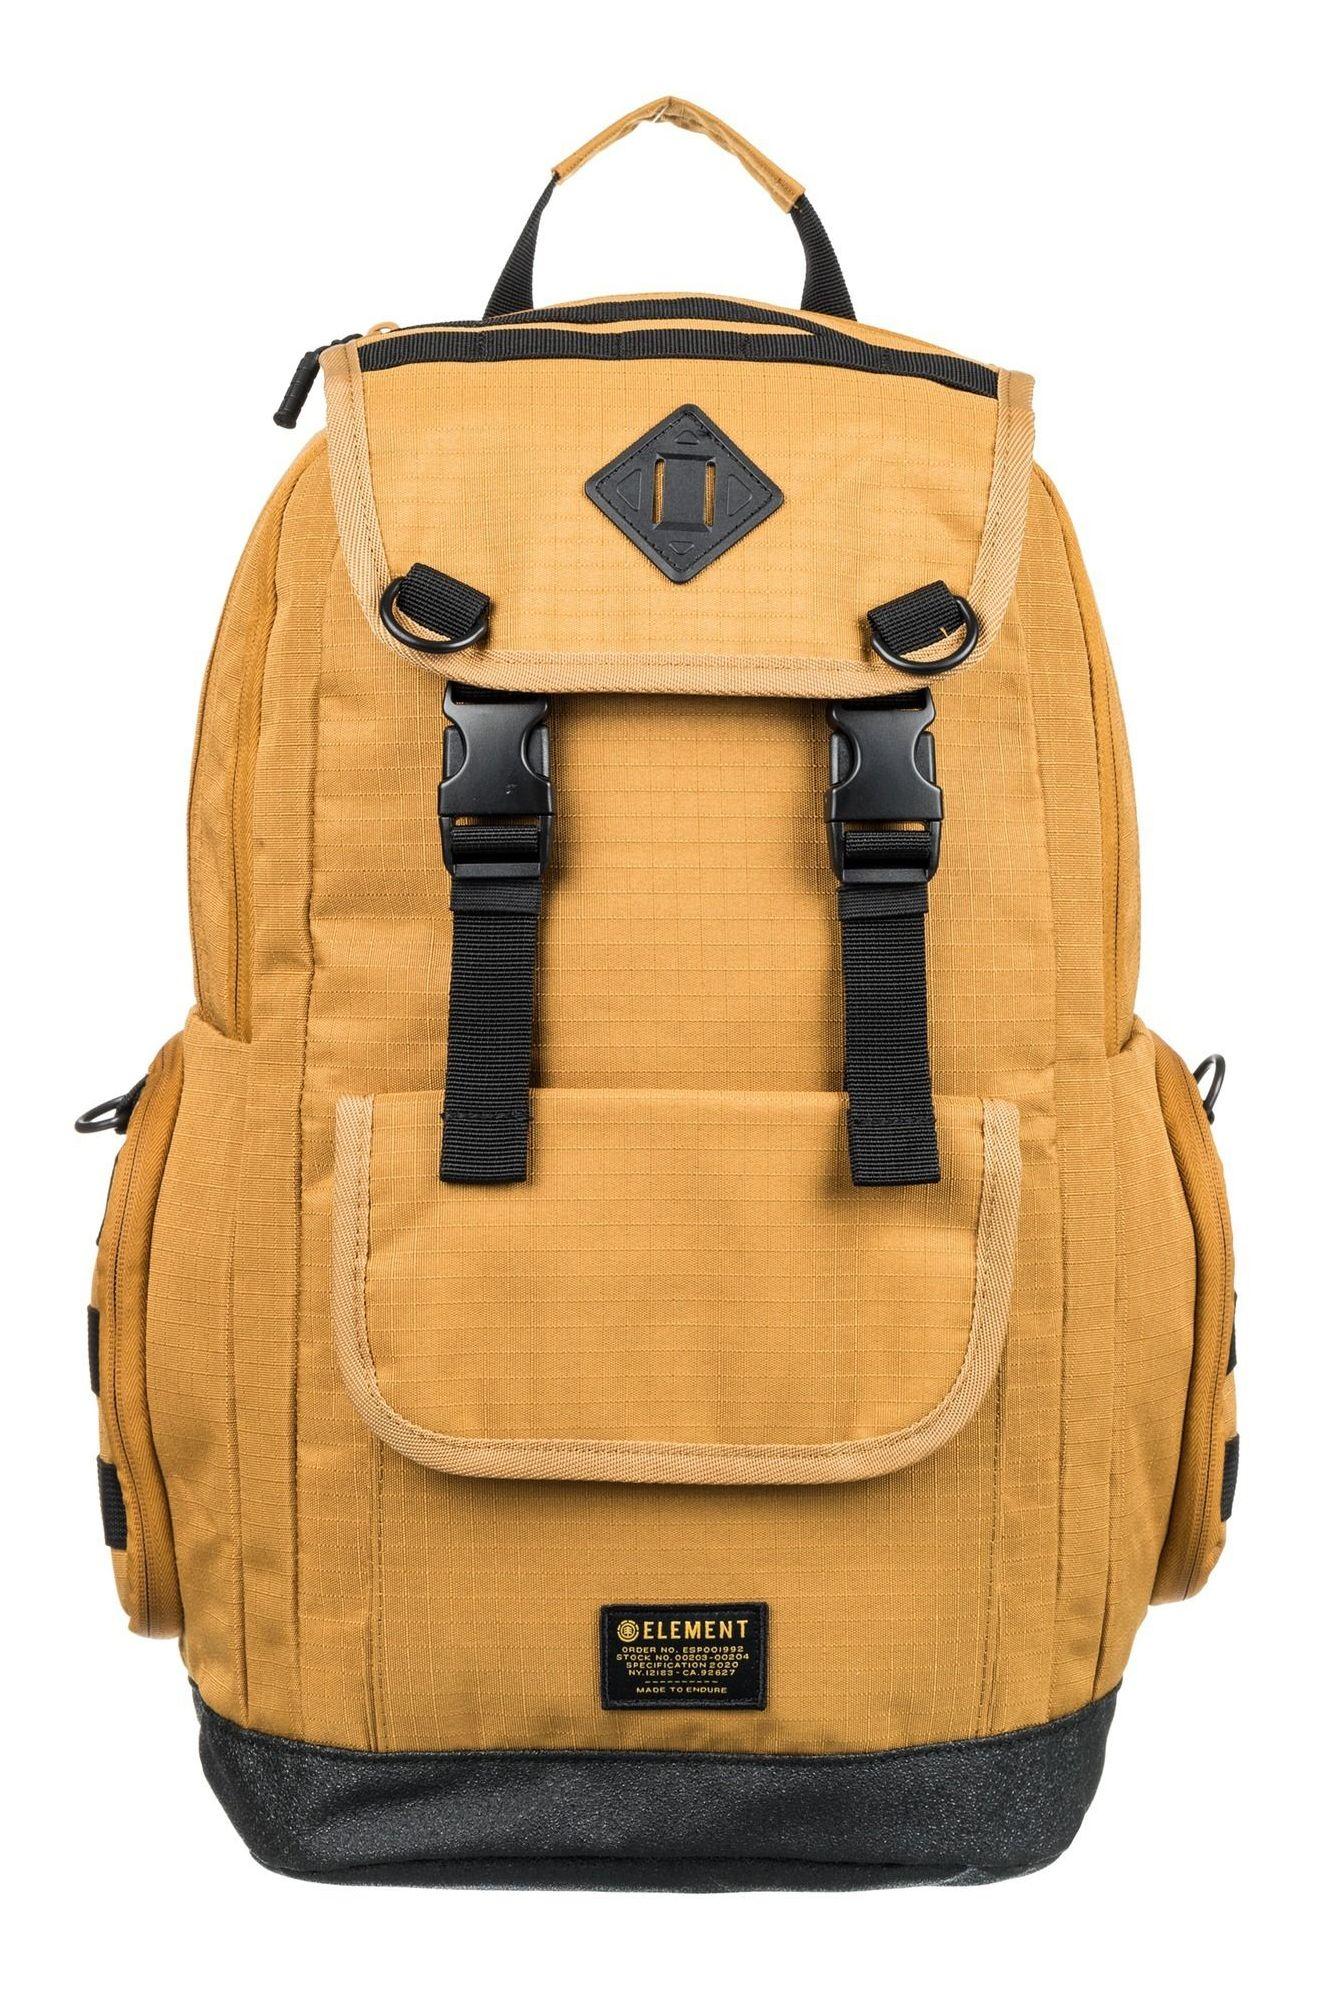 Element Backpack CYPRESS RECRUIT BPK Gold Brown